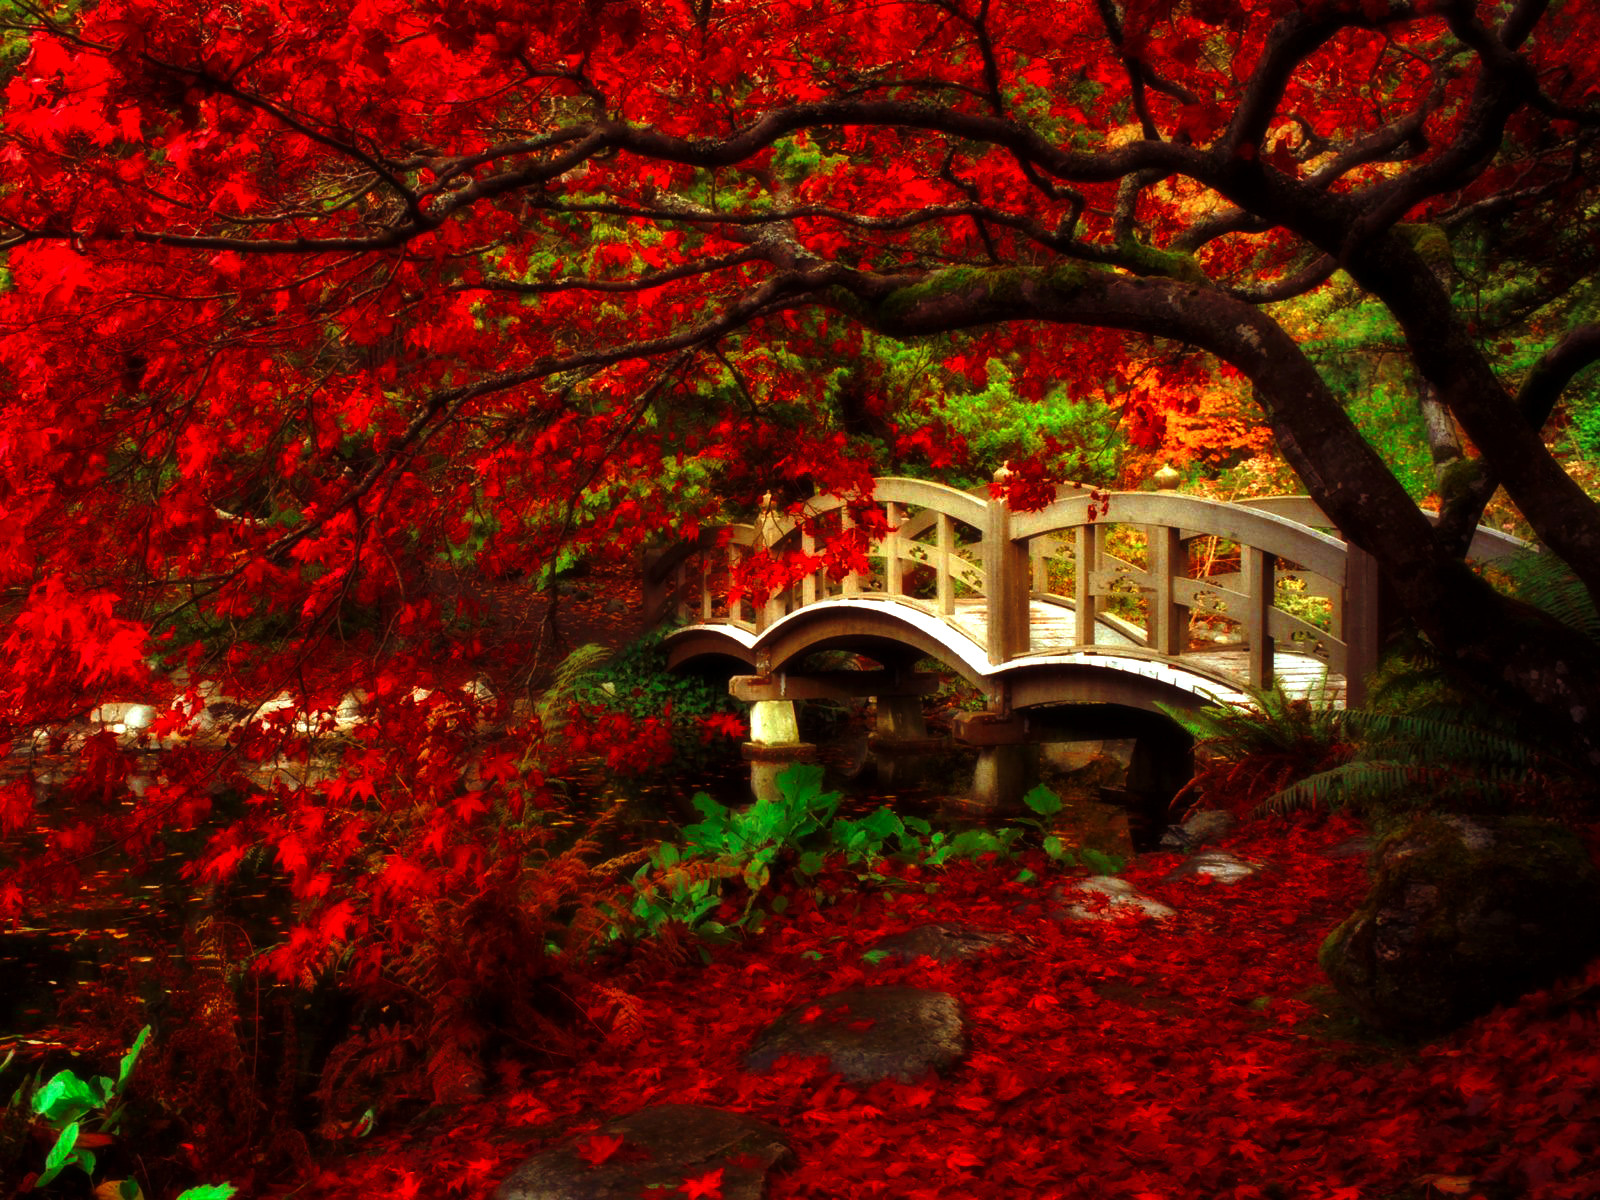 Japan Garden Flowers: Japanese Garden, Royal Roads University, British C By